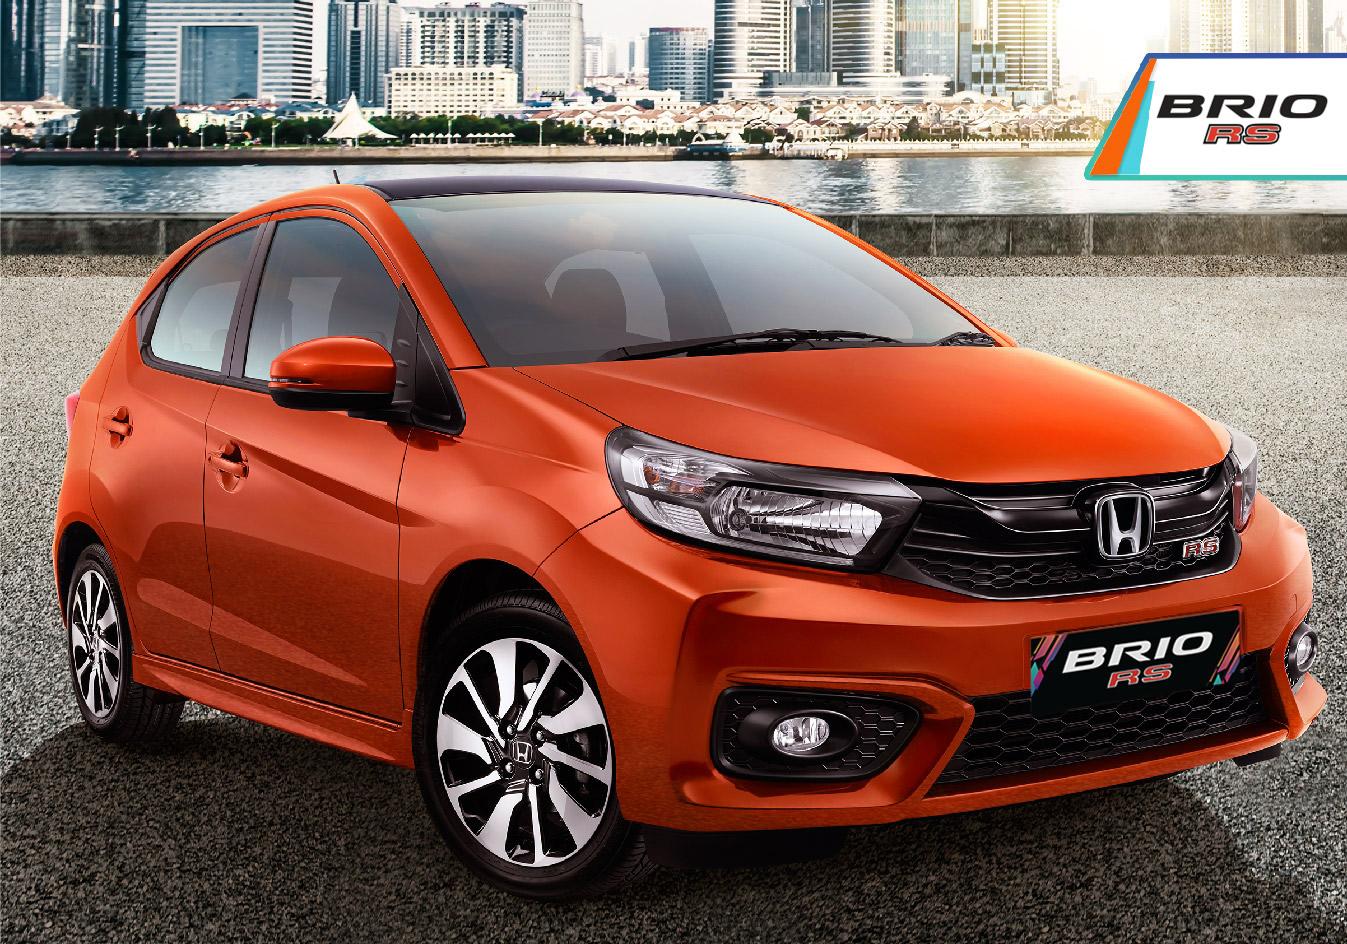 All-New-Honda-Brio-RS-Front-Angle